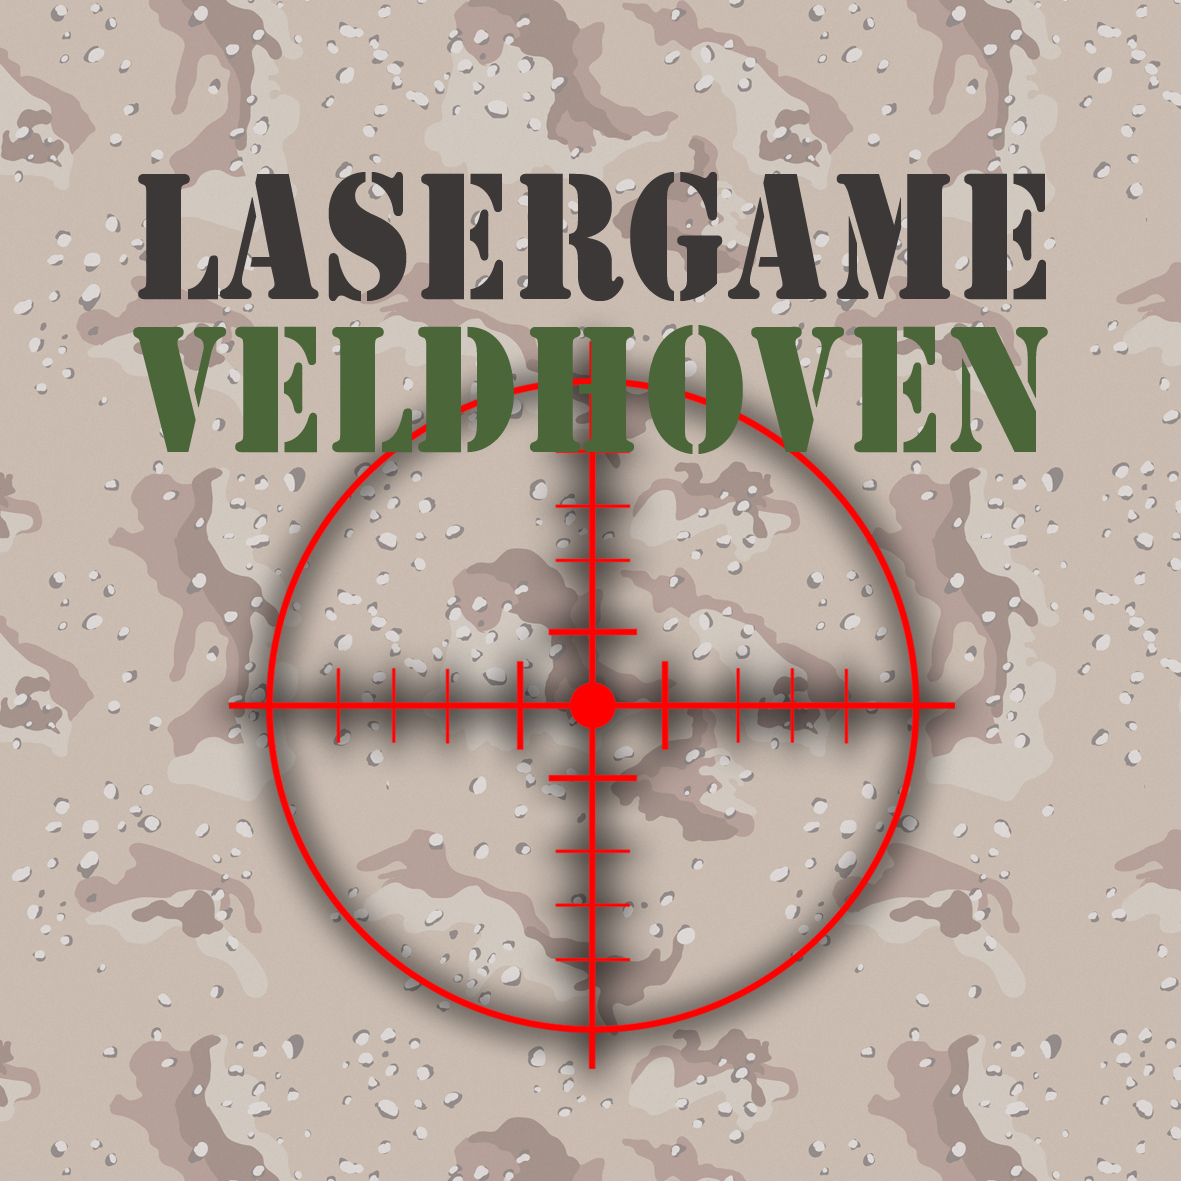 Lasergame Veldhoven